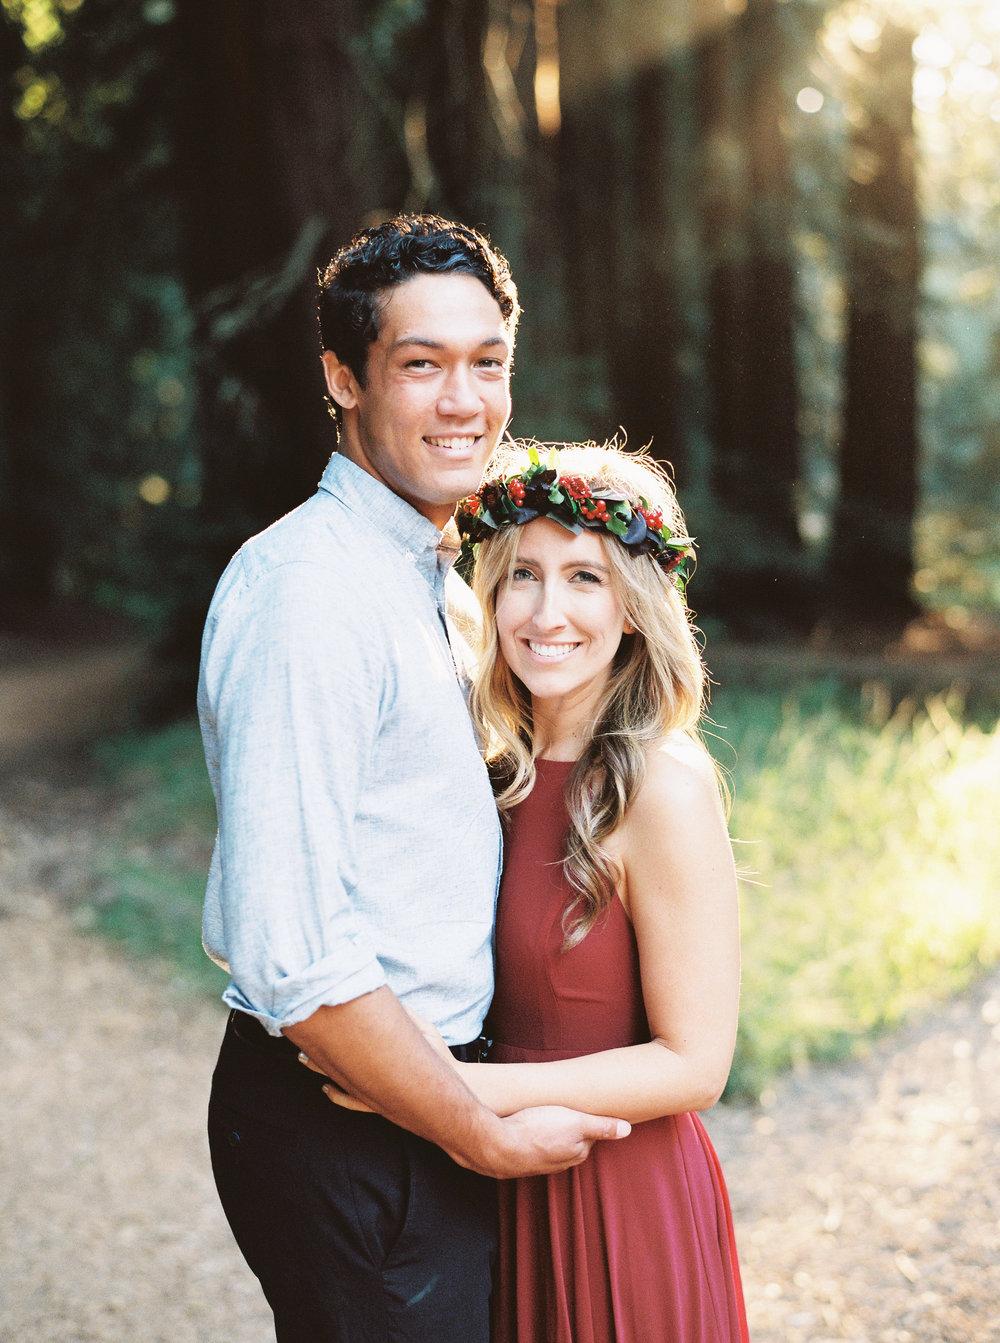 redwood-forest-engagement-in-oakland-california-108.jpg